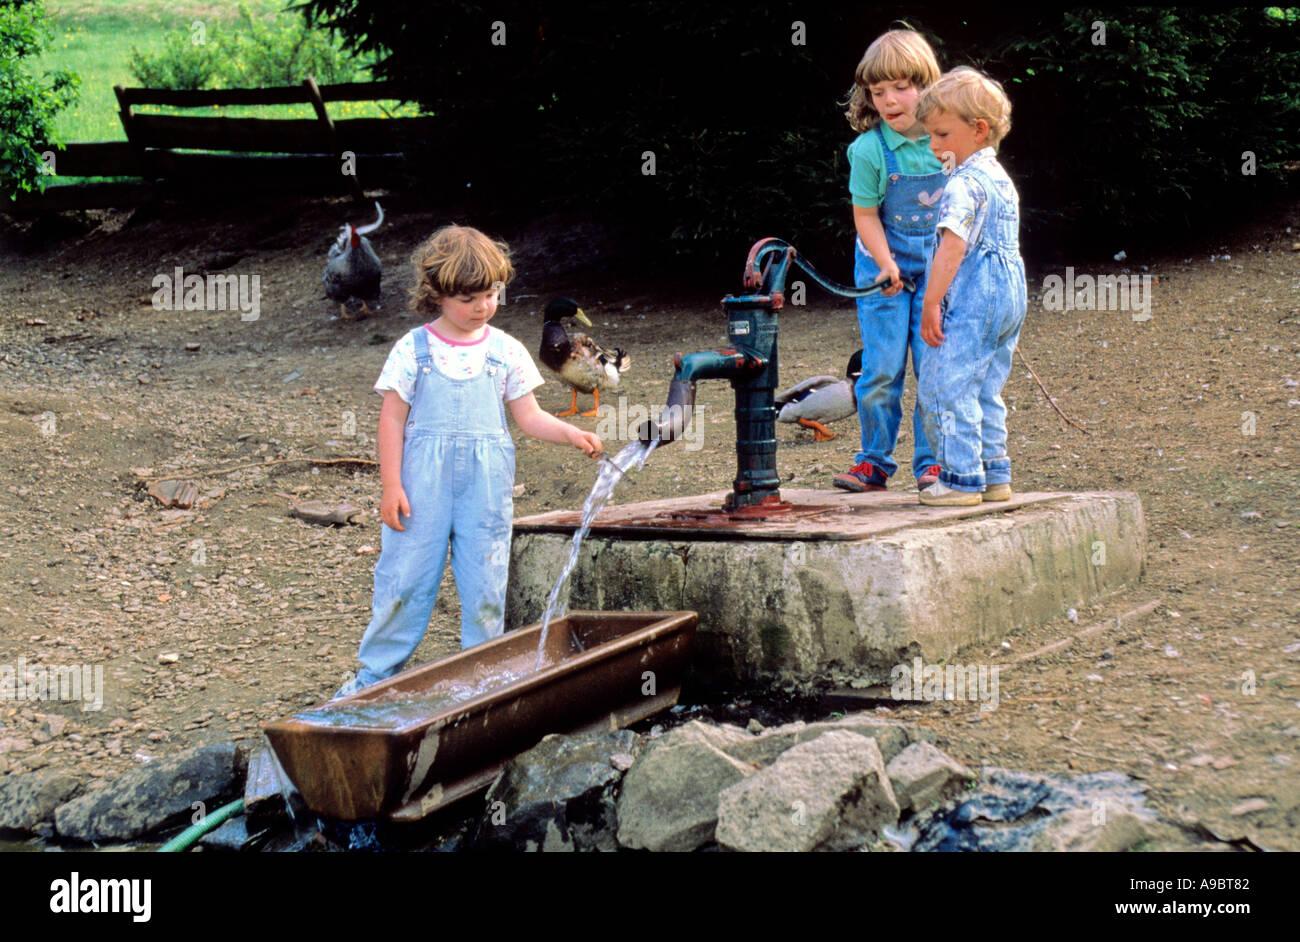 kids enjoying fountain at farmstead - Stock Image